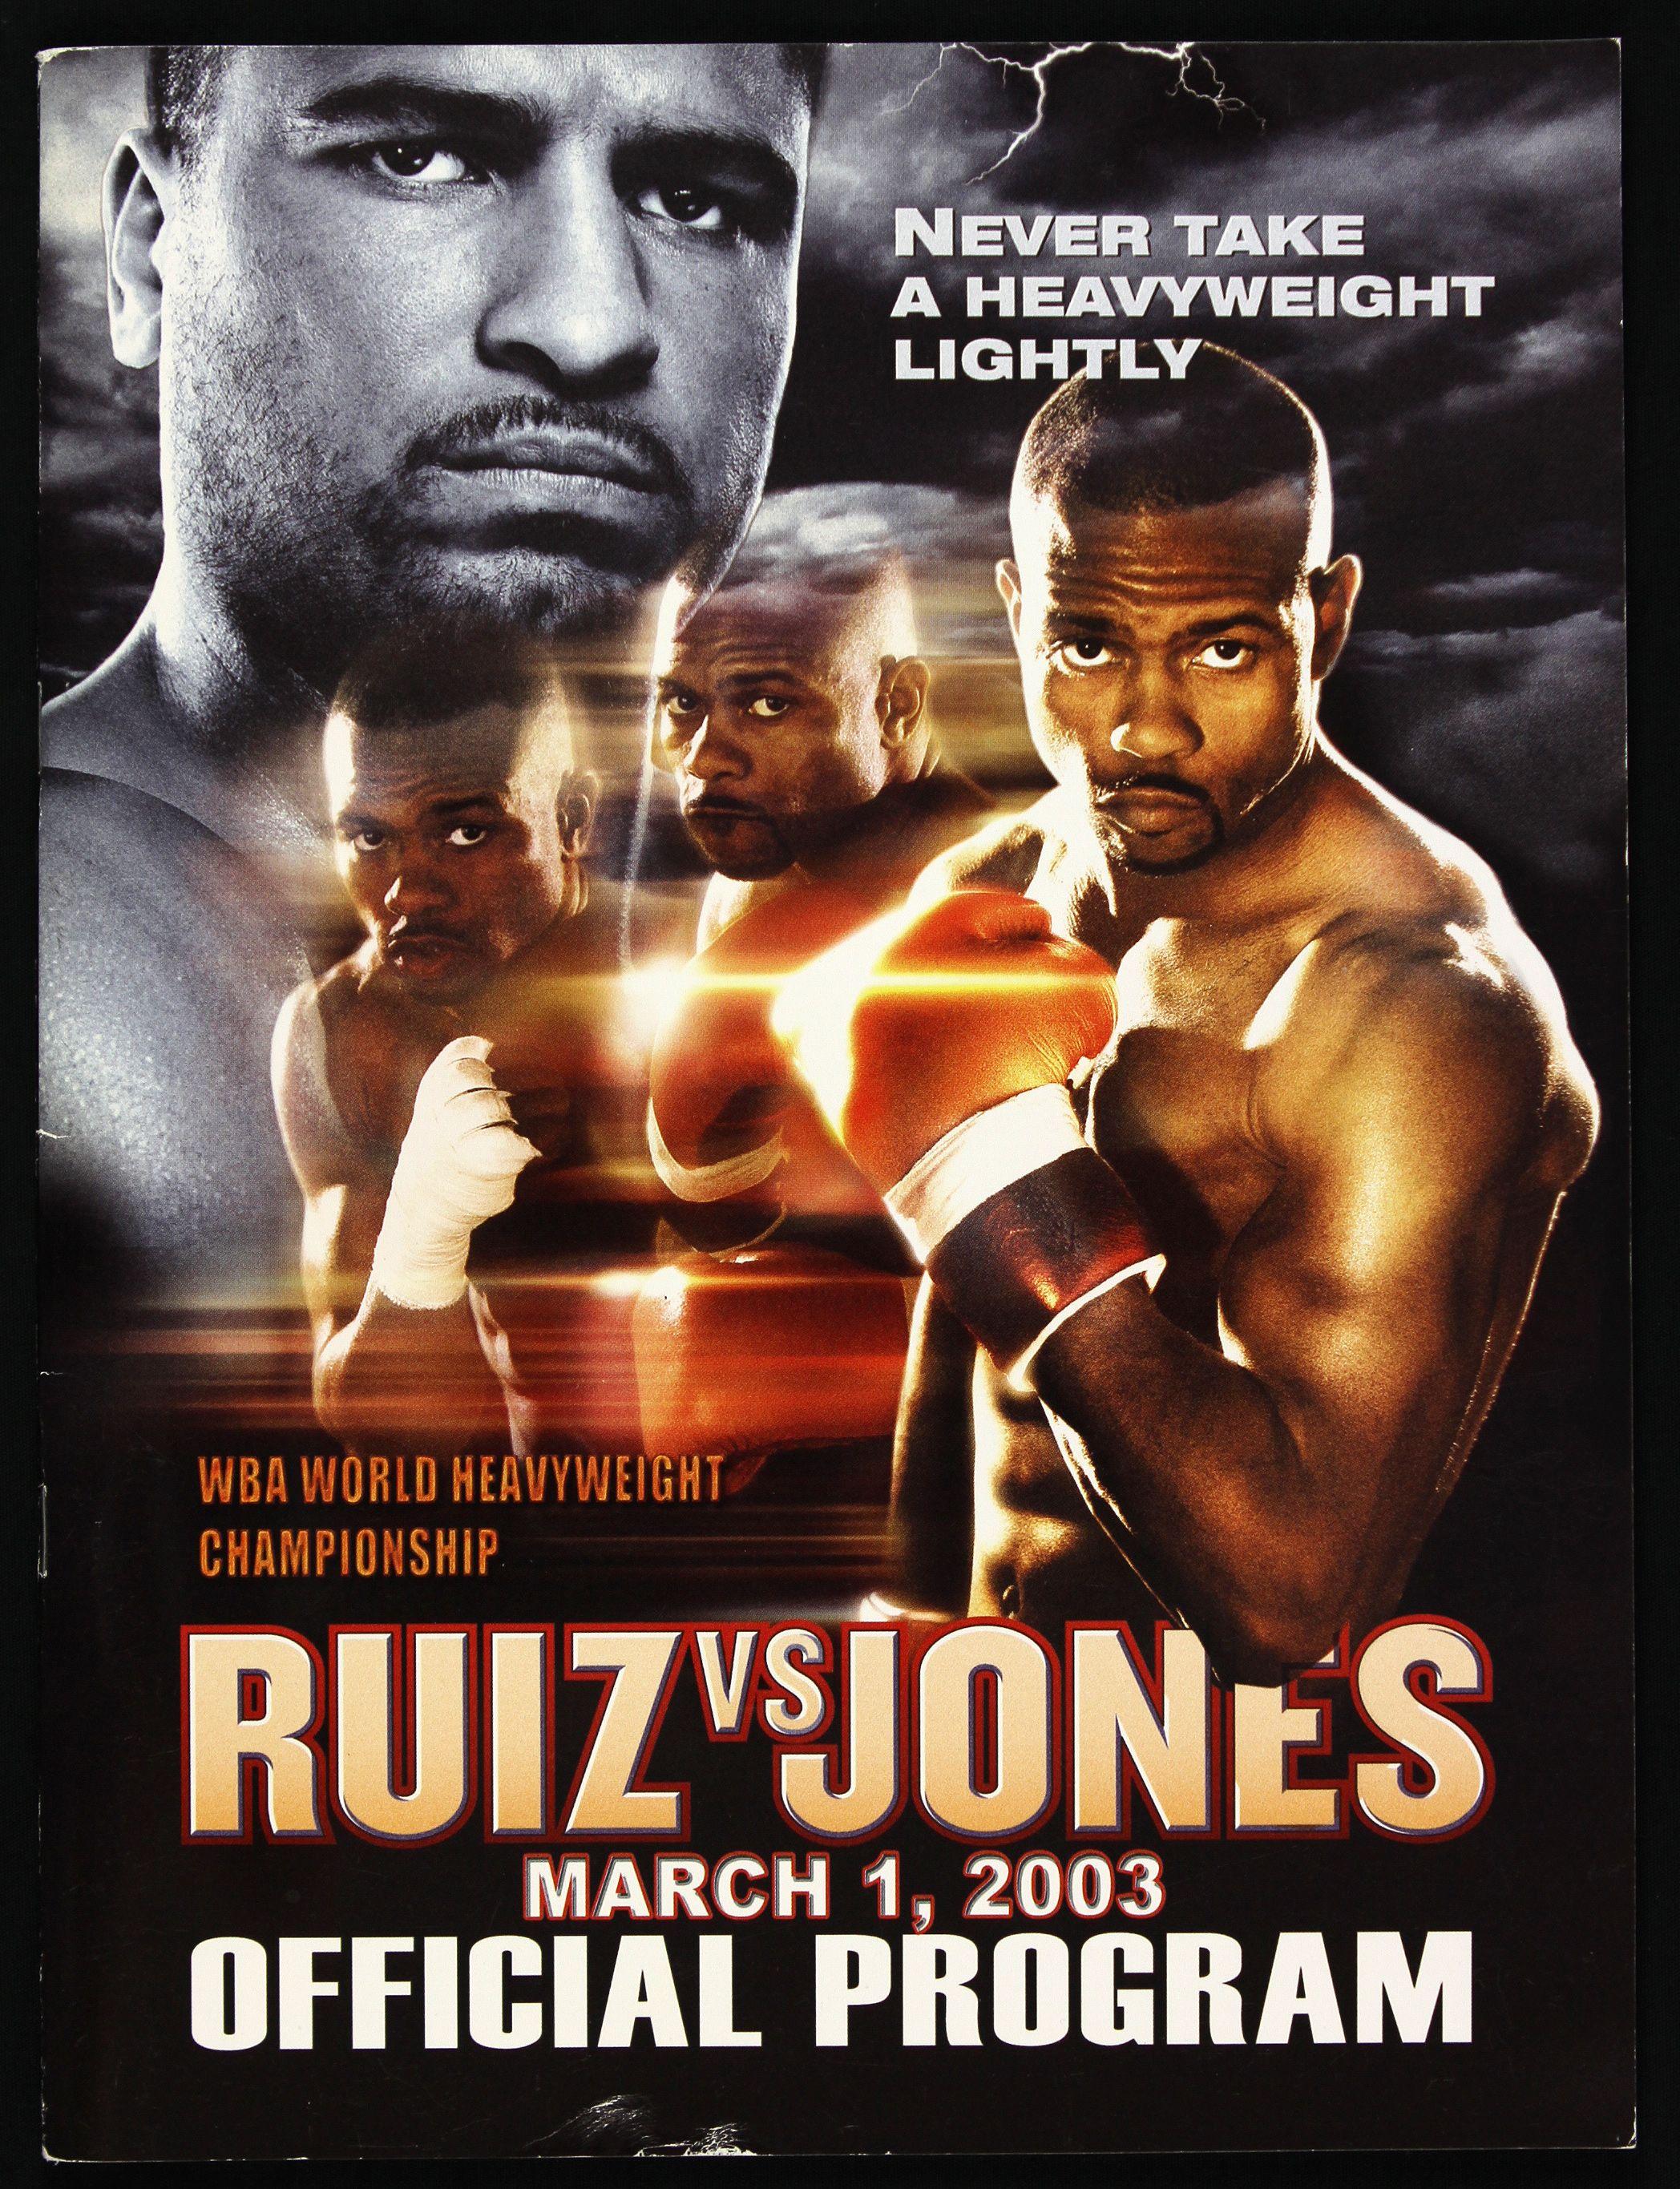 FIGHT PROGRAM JONES-RUIZ.